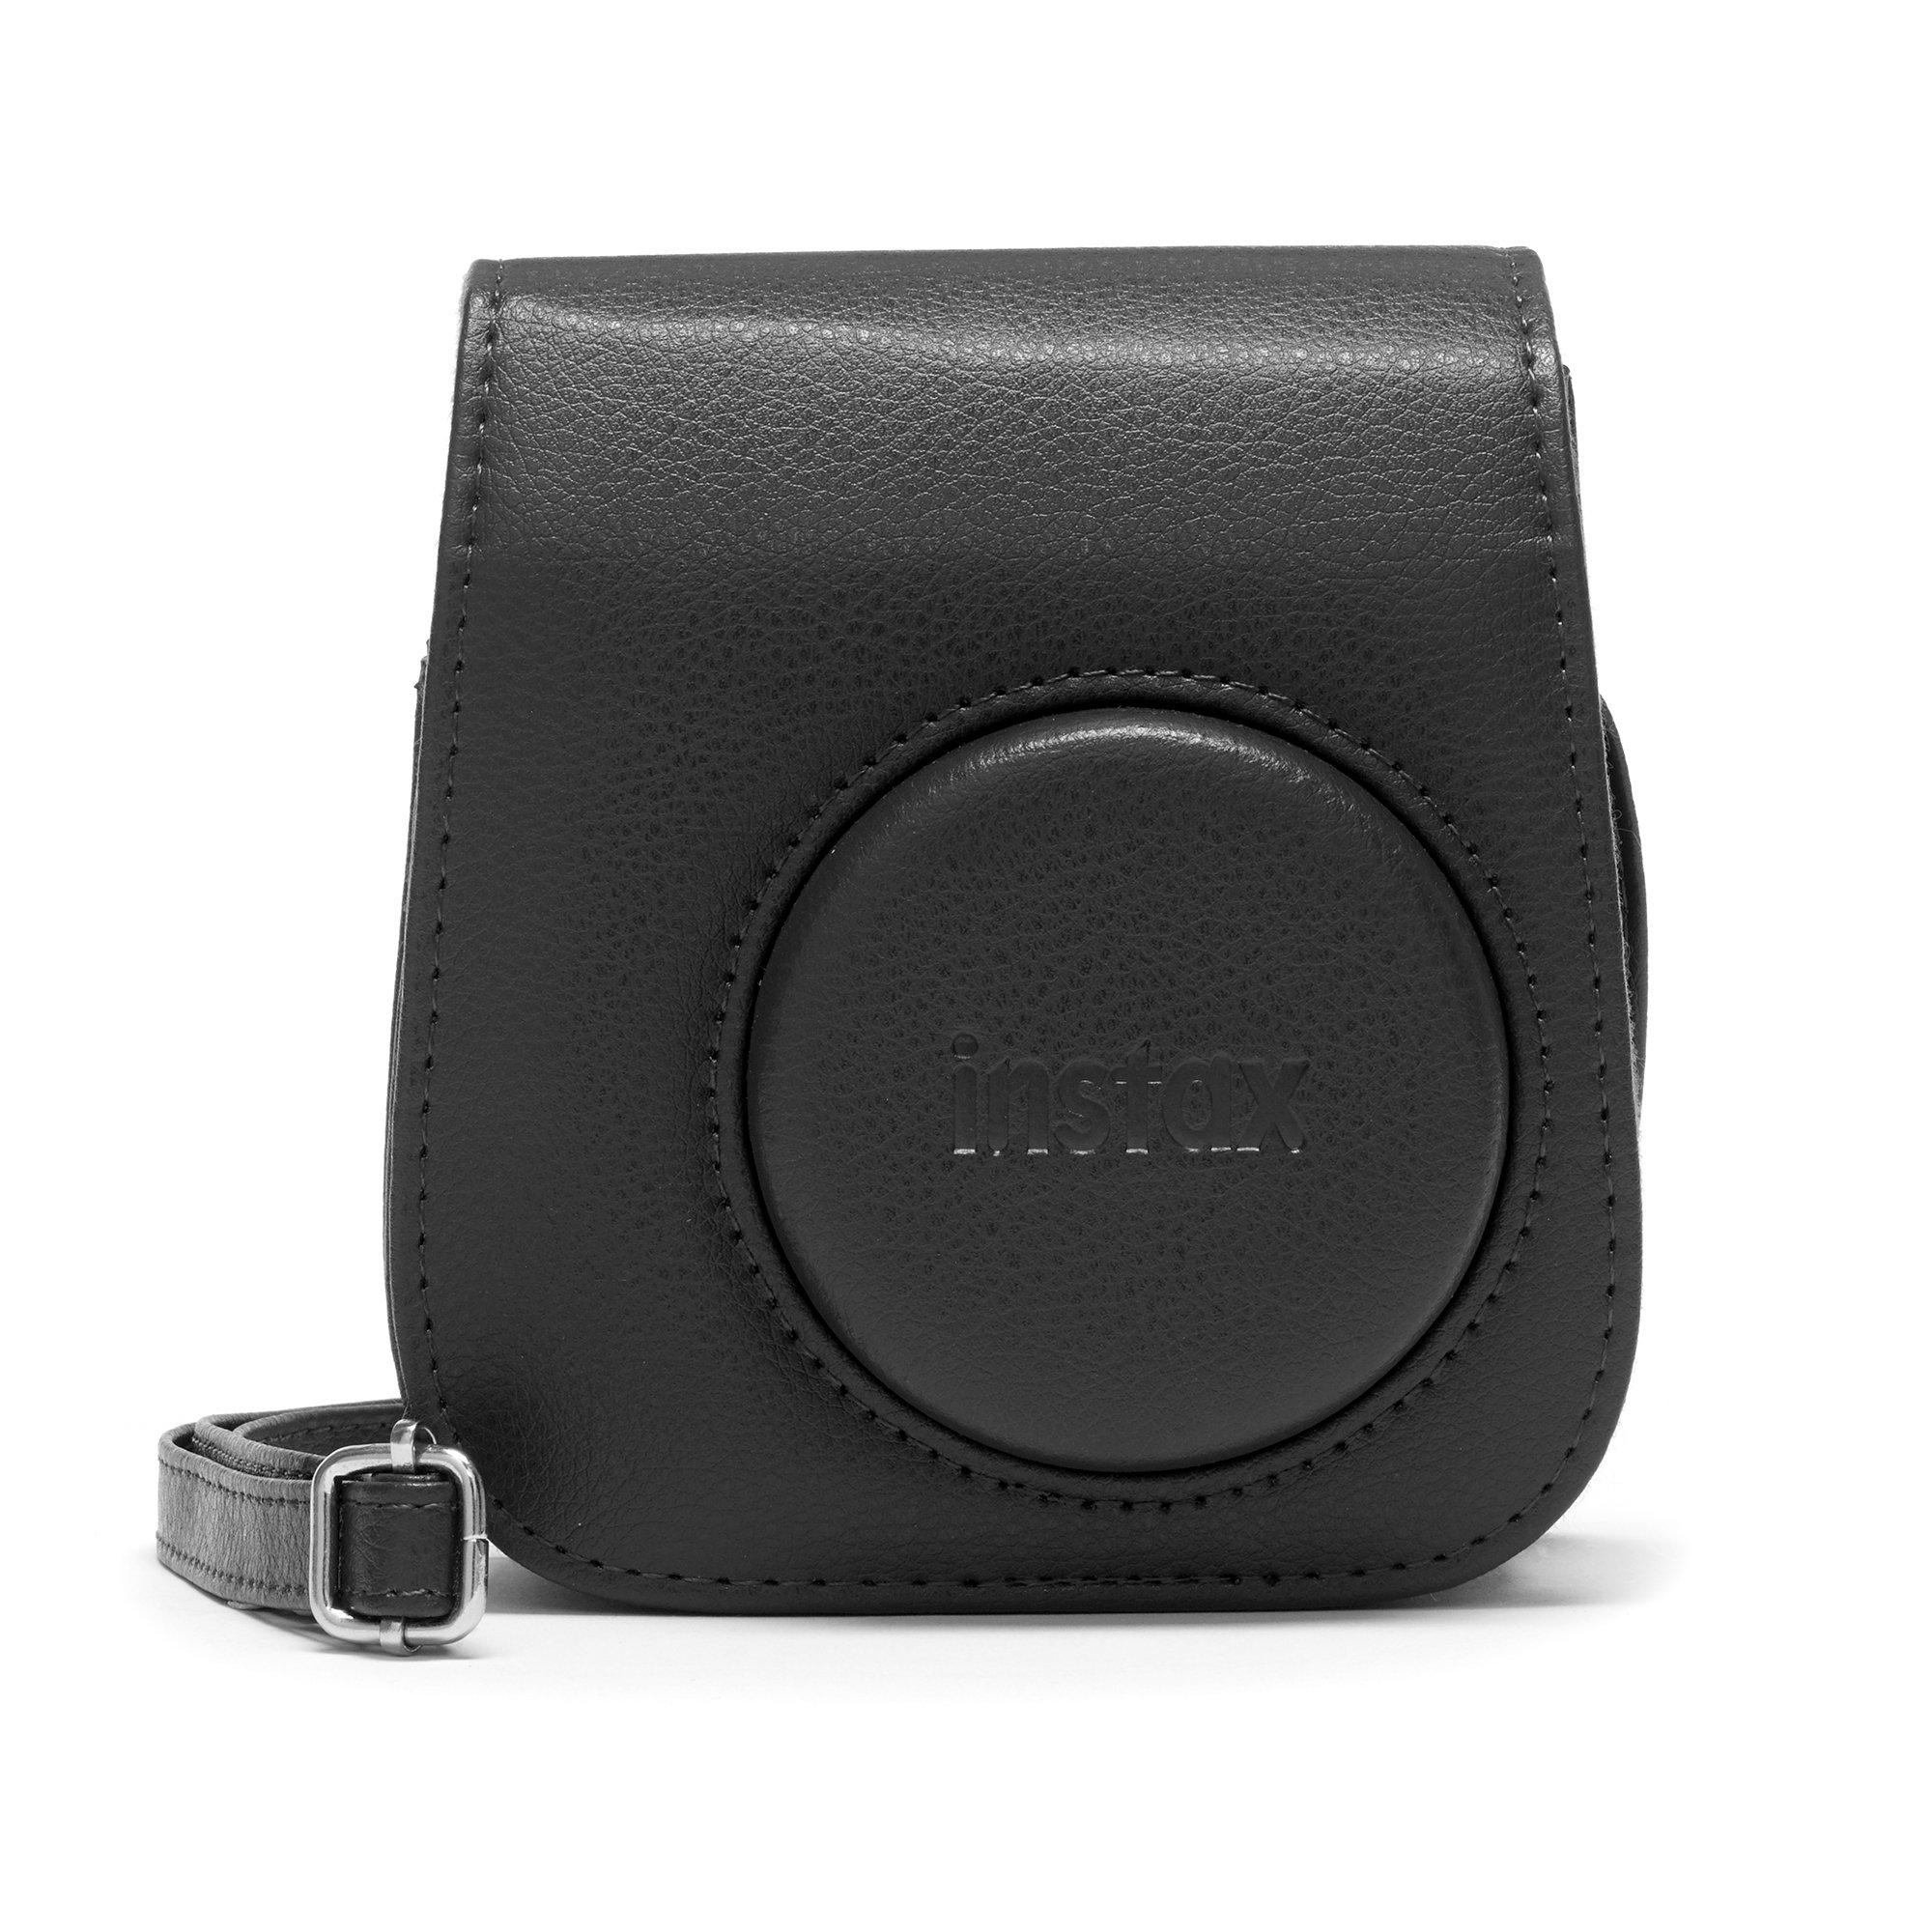 Accessoire kit instax mini 11 - Charcoal Gray